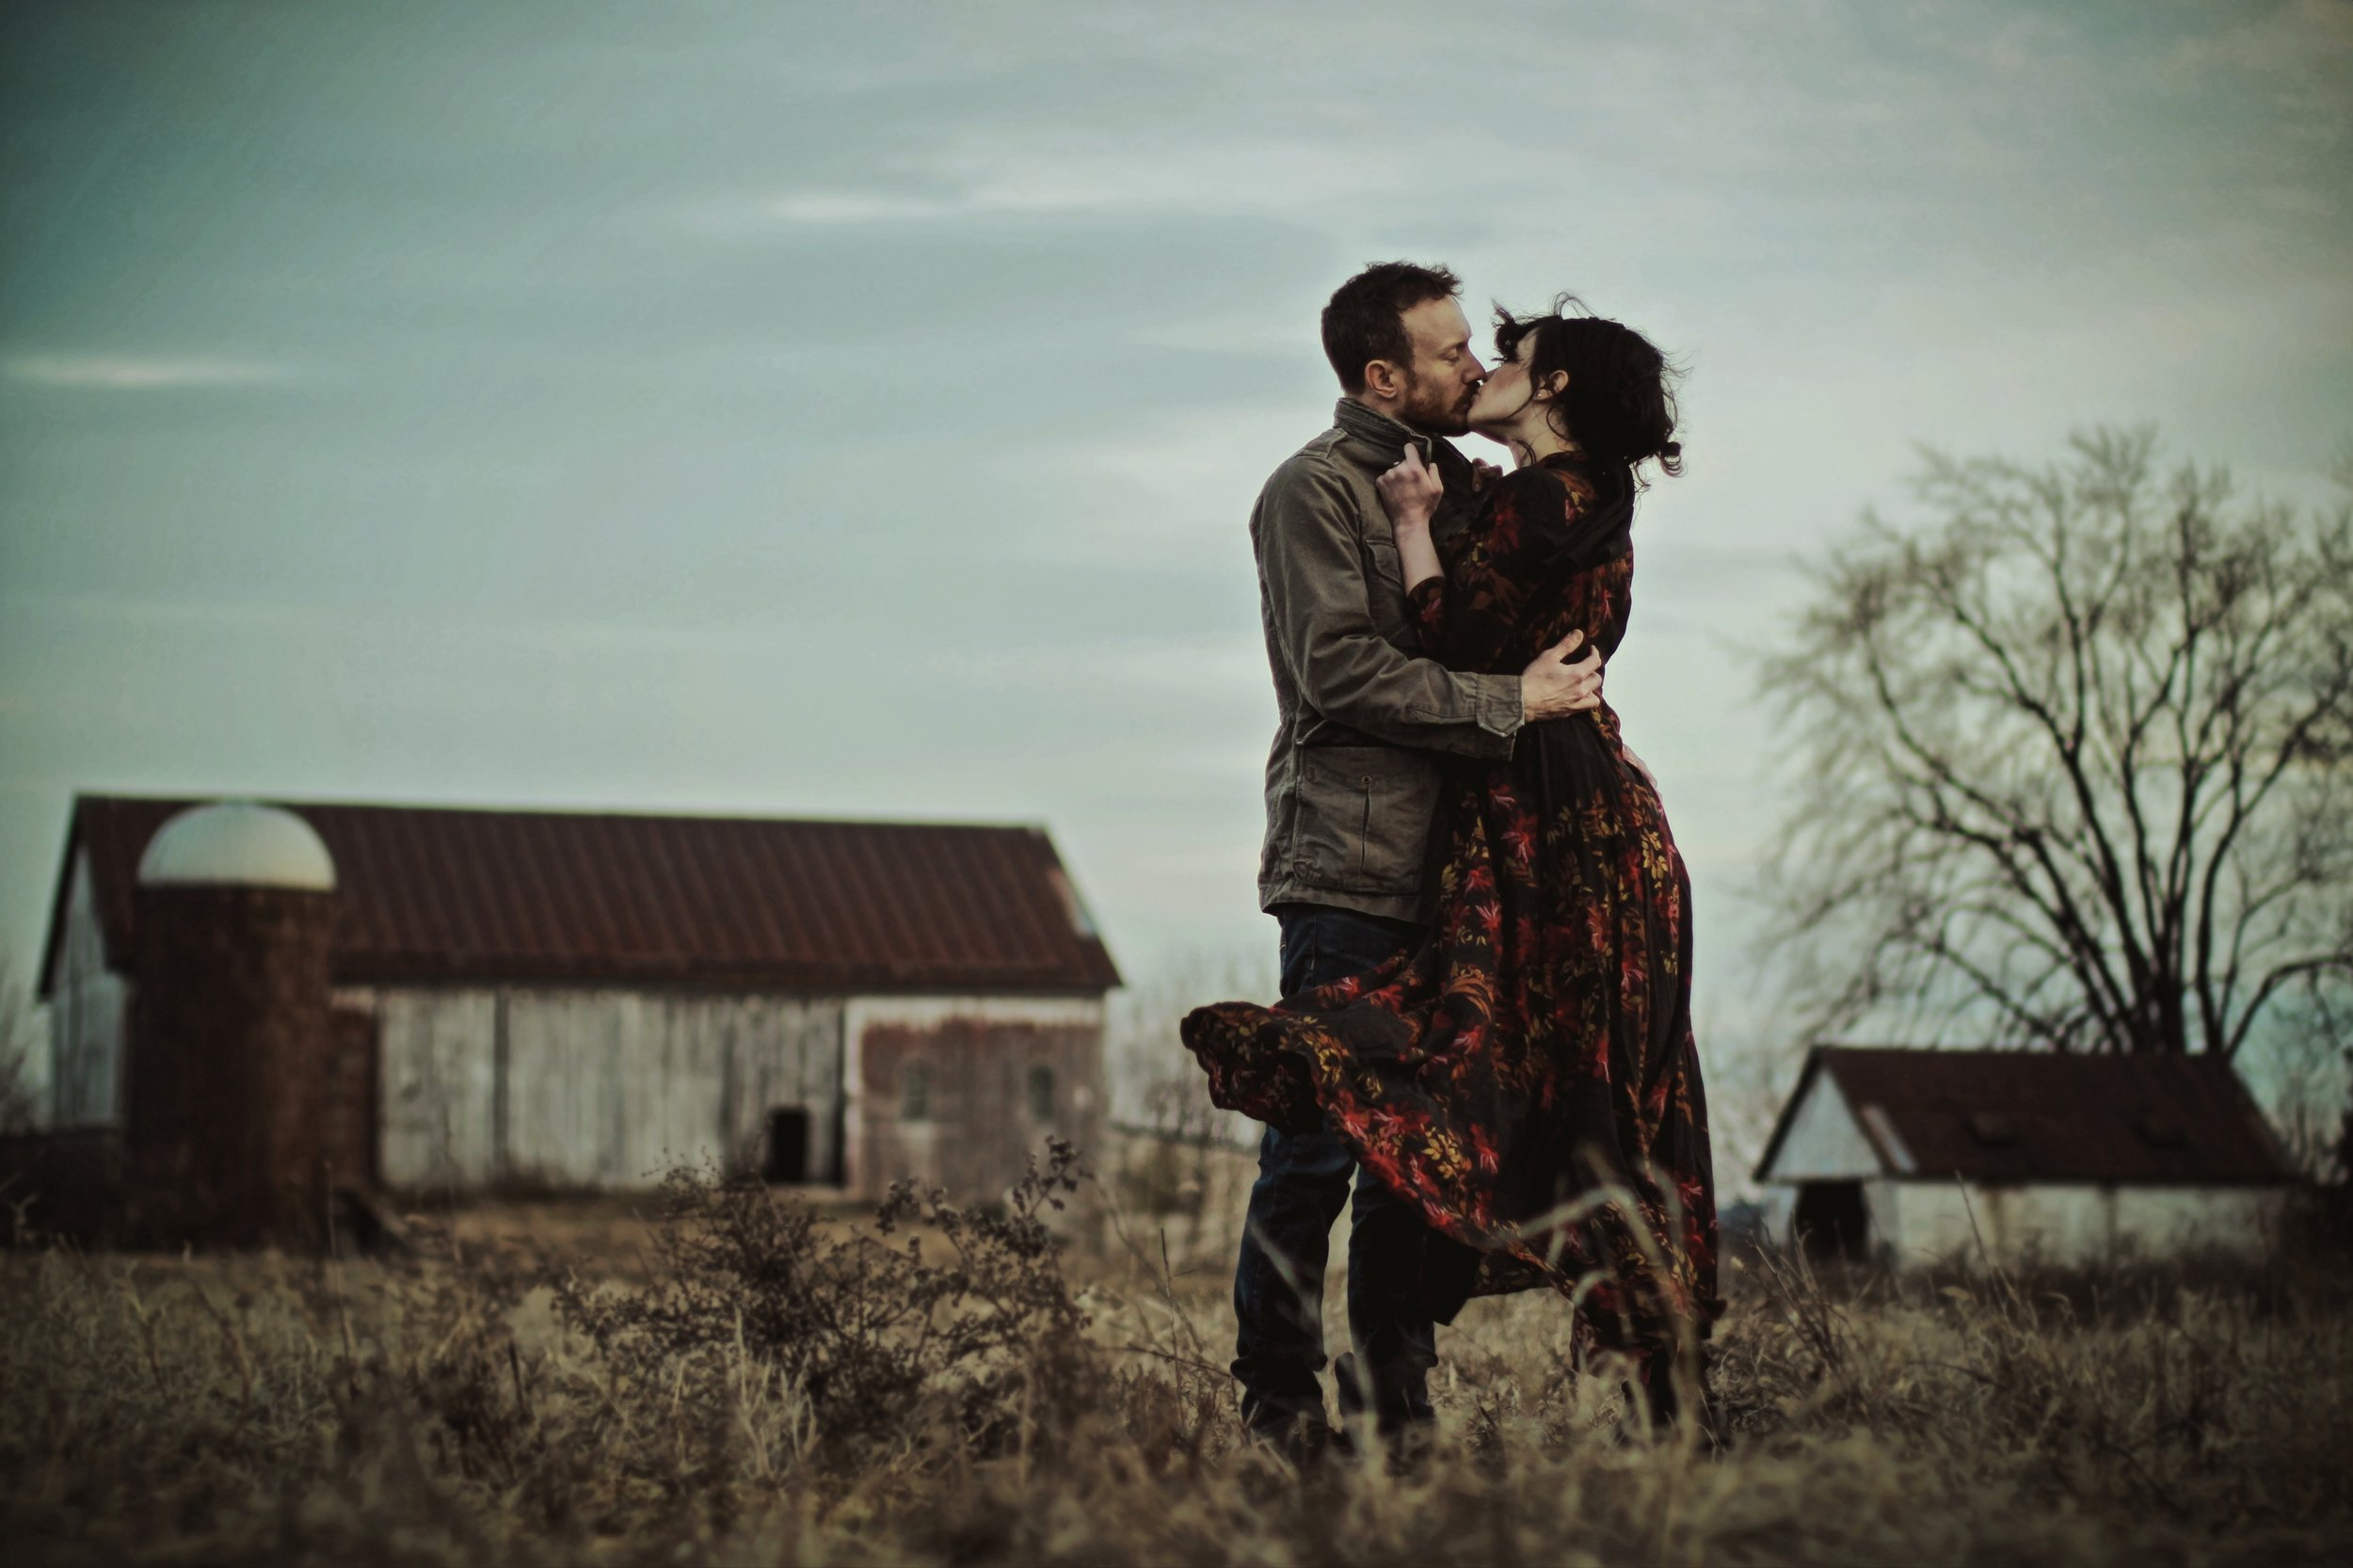 Evie & Daniel